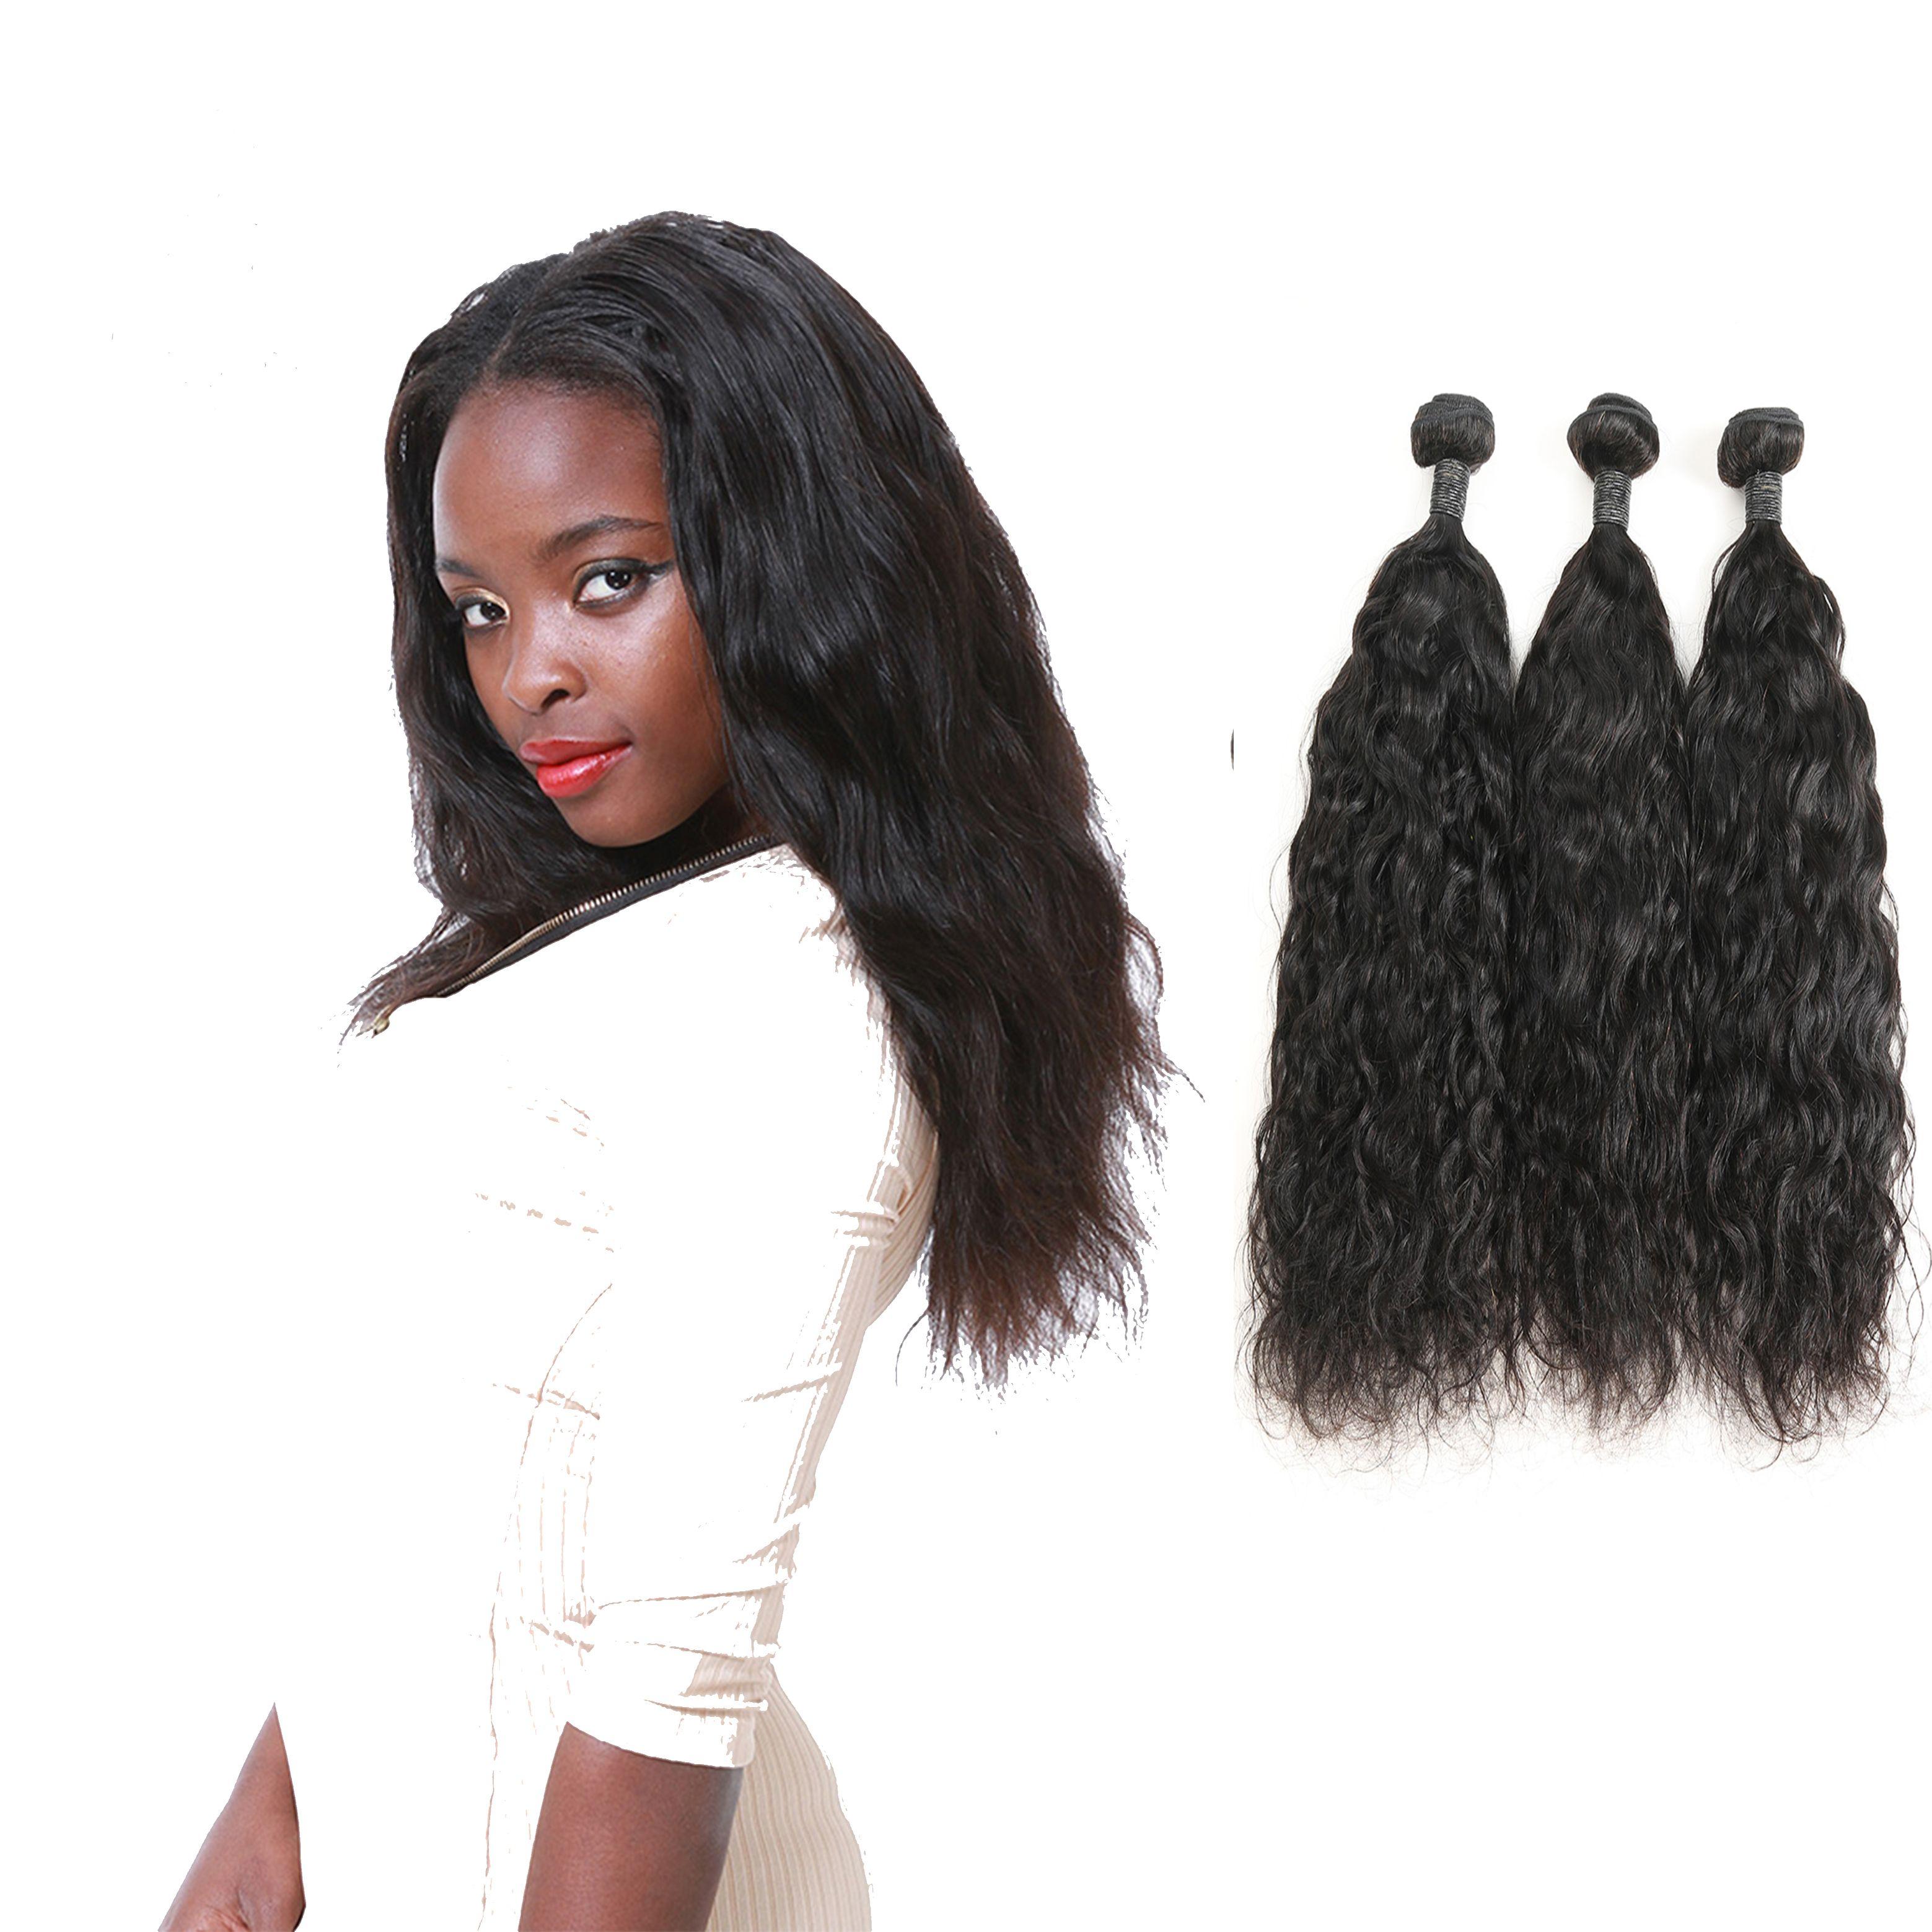 Indian Cheap Hair Bundles Soft Human Hair Weaves 3 Bundles Natural Wave Real  Human Hair Extensions Skin Weft Seamless Hair Extensions Ez Weft Hair ... 2bbb975fd